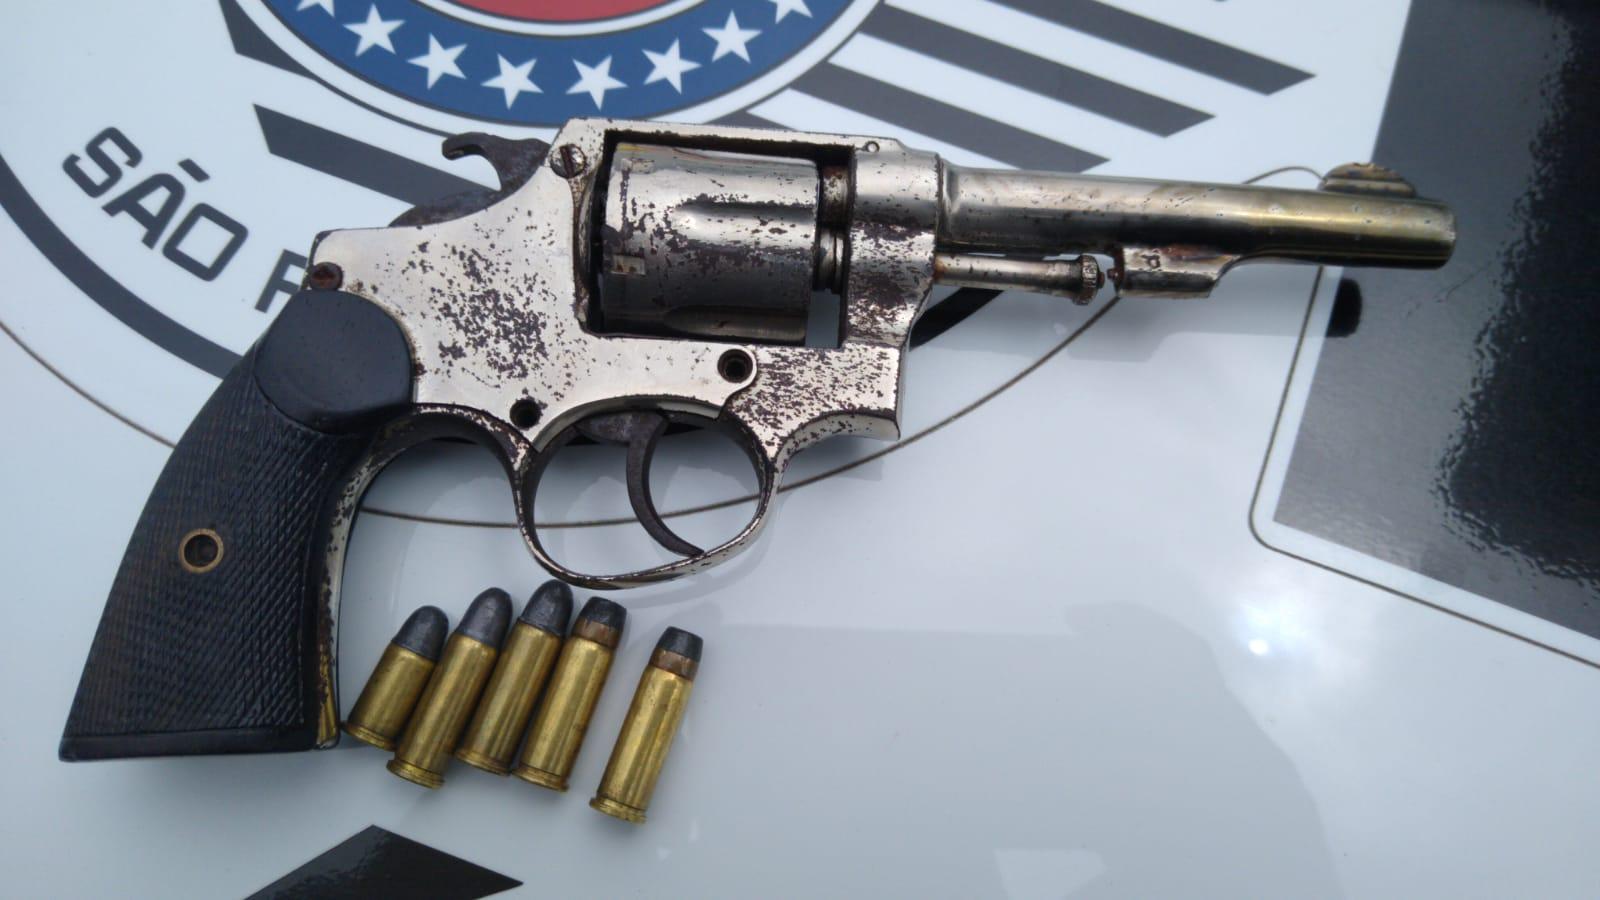 Porte ilegal de arma